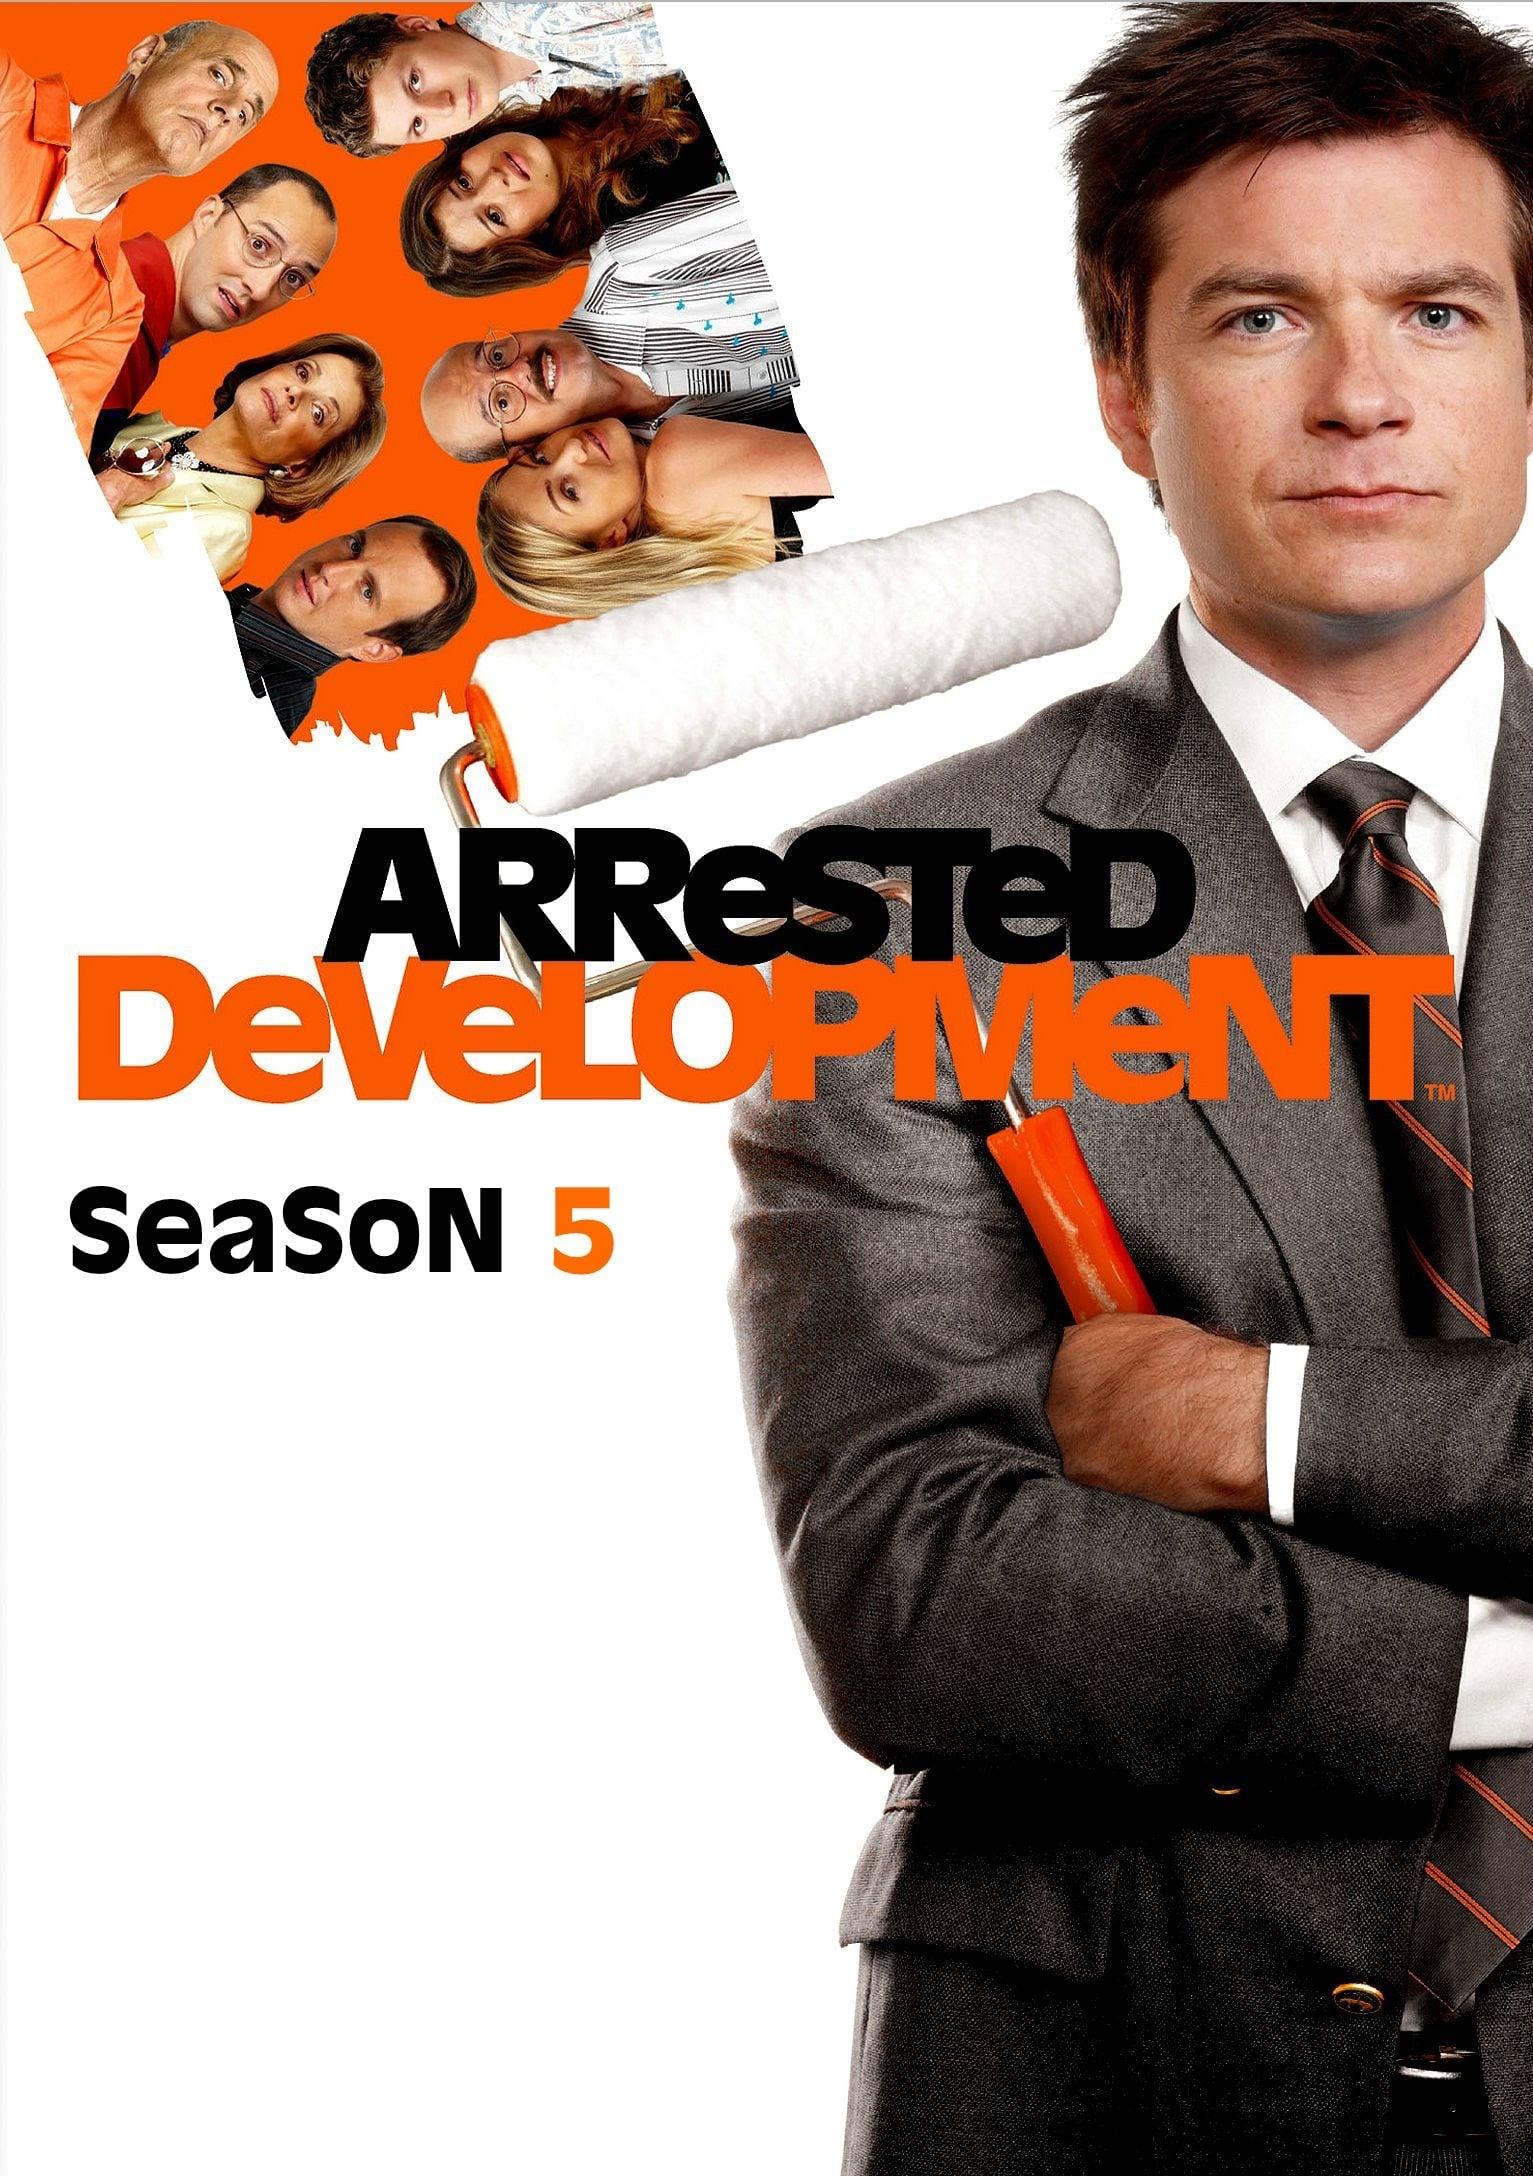 Arrested Development Season 5